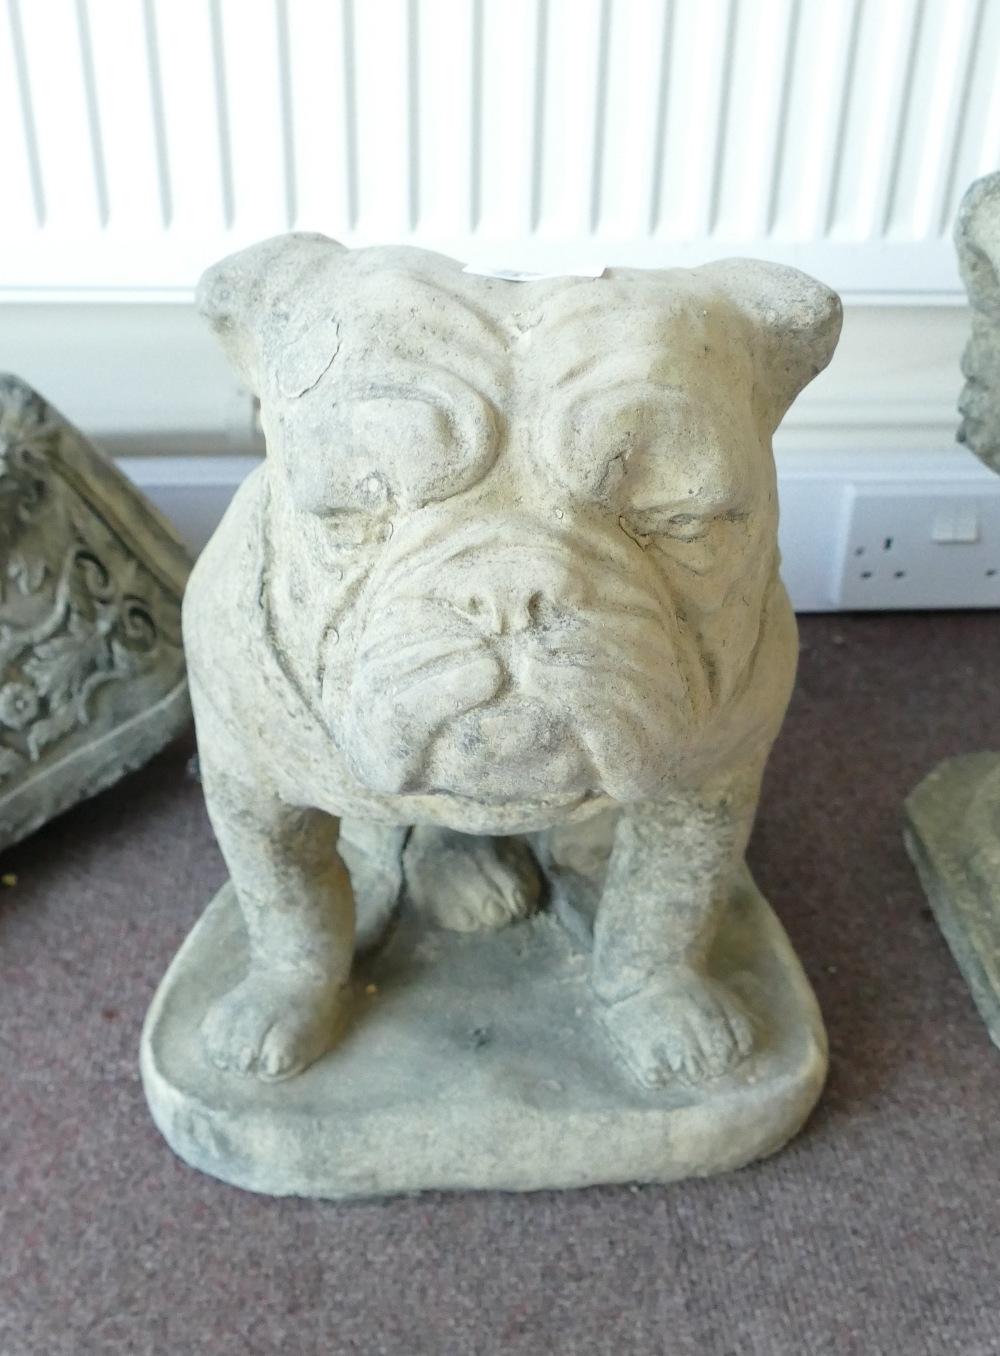 Devonshire Stone model of seated Bulldog, h40cm: - Image 2 of 2